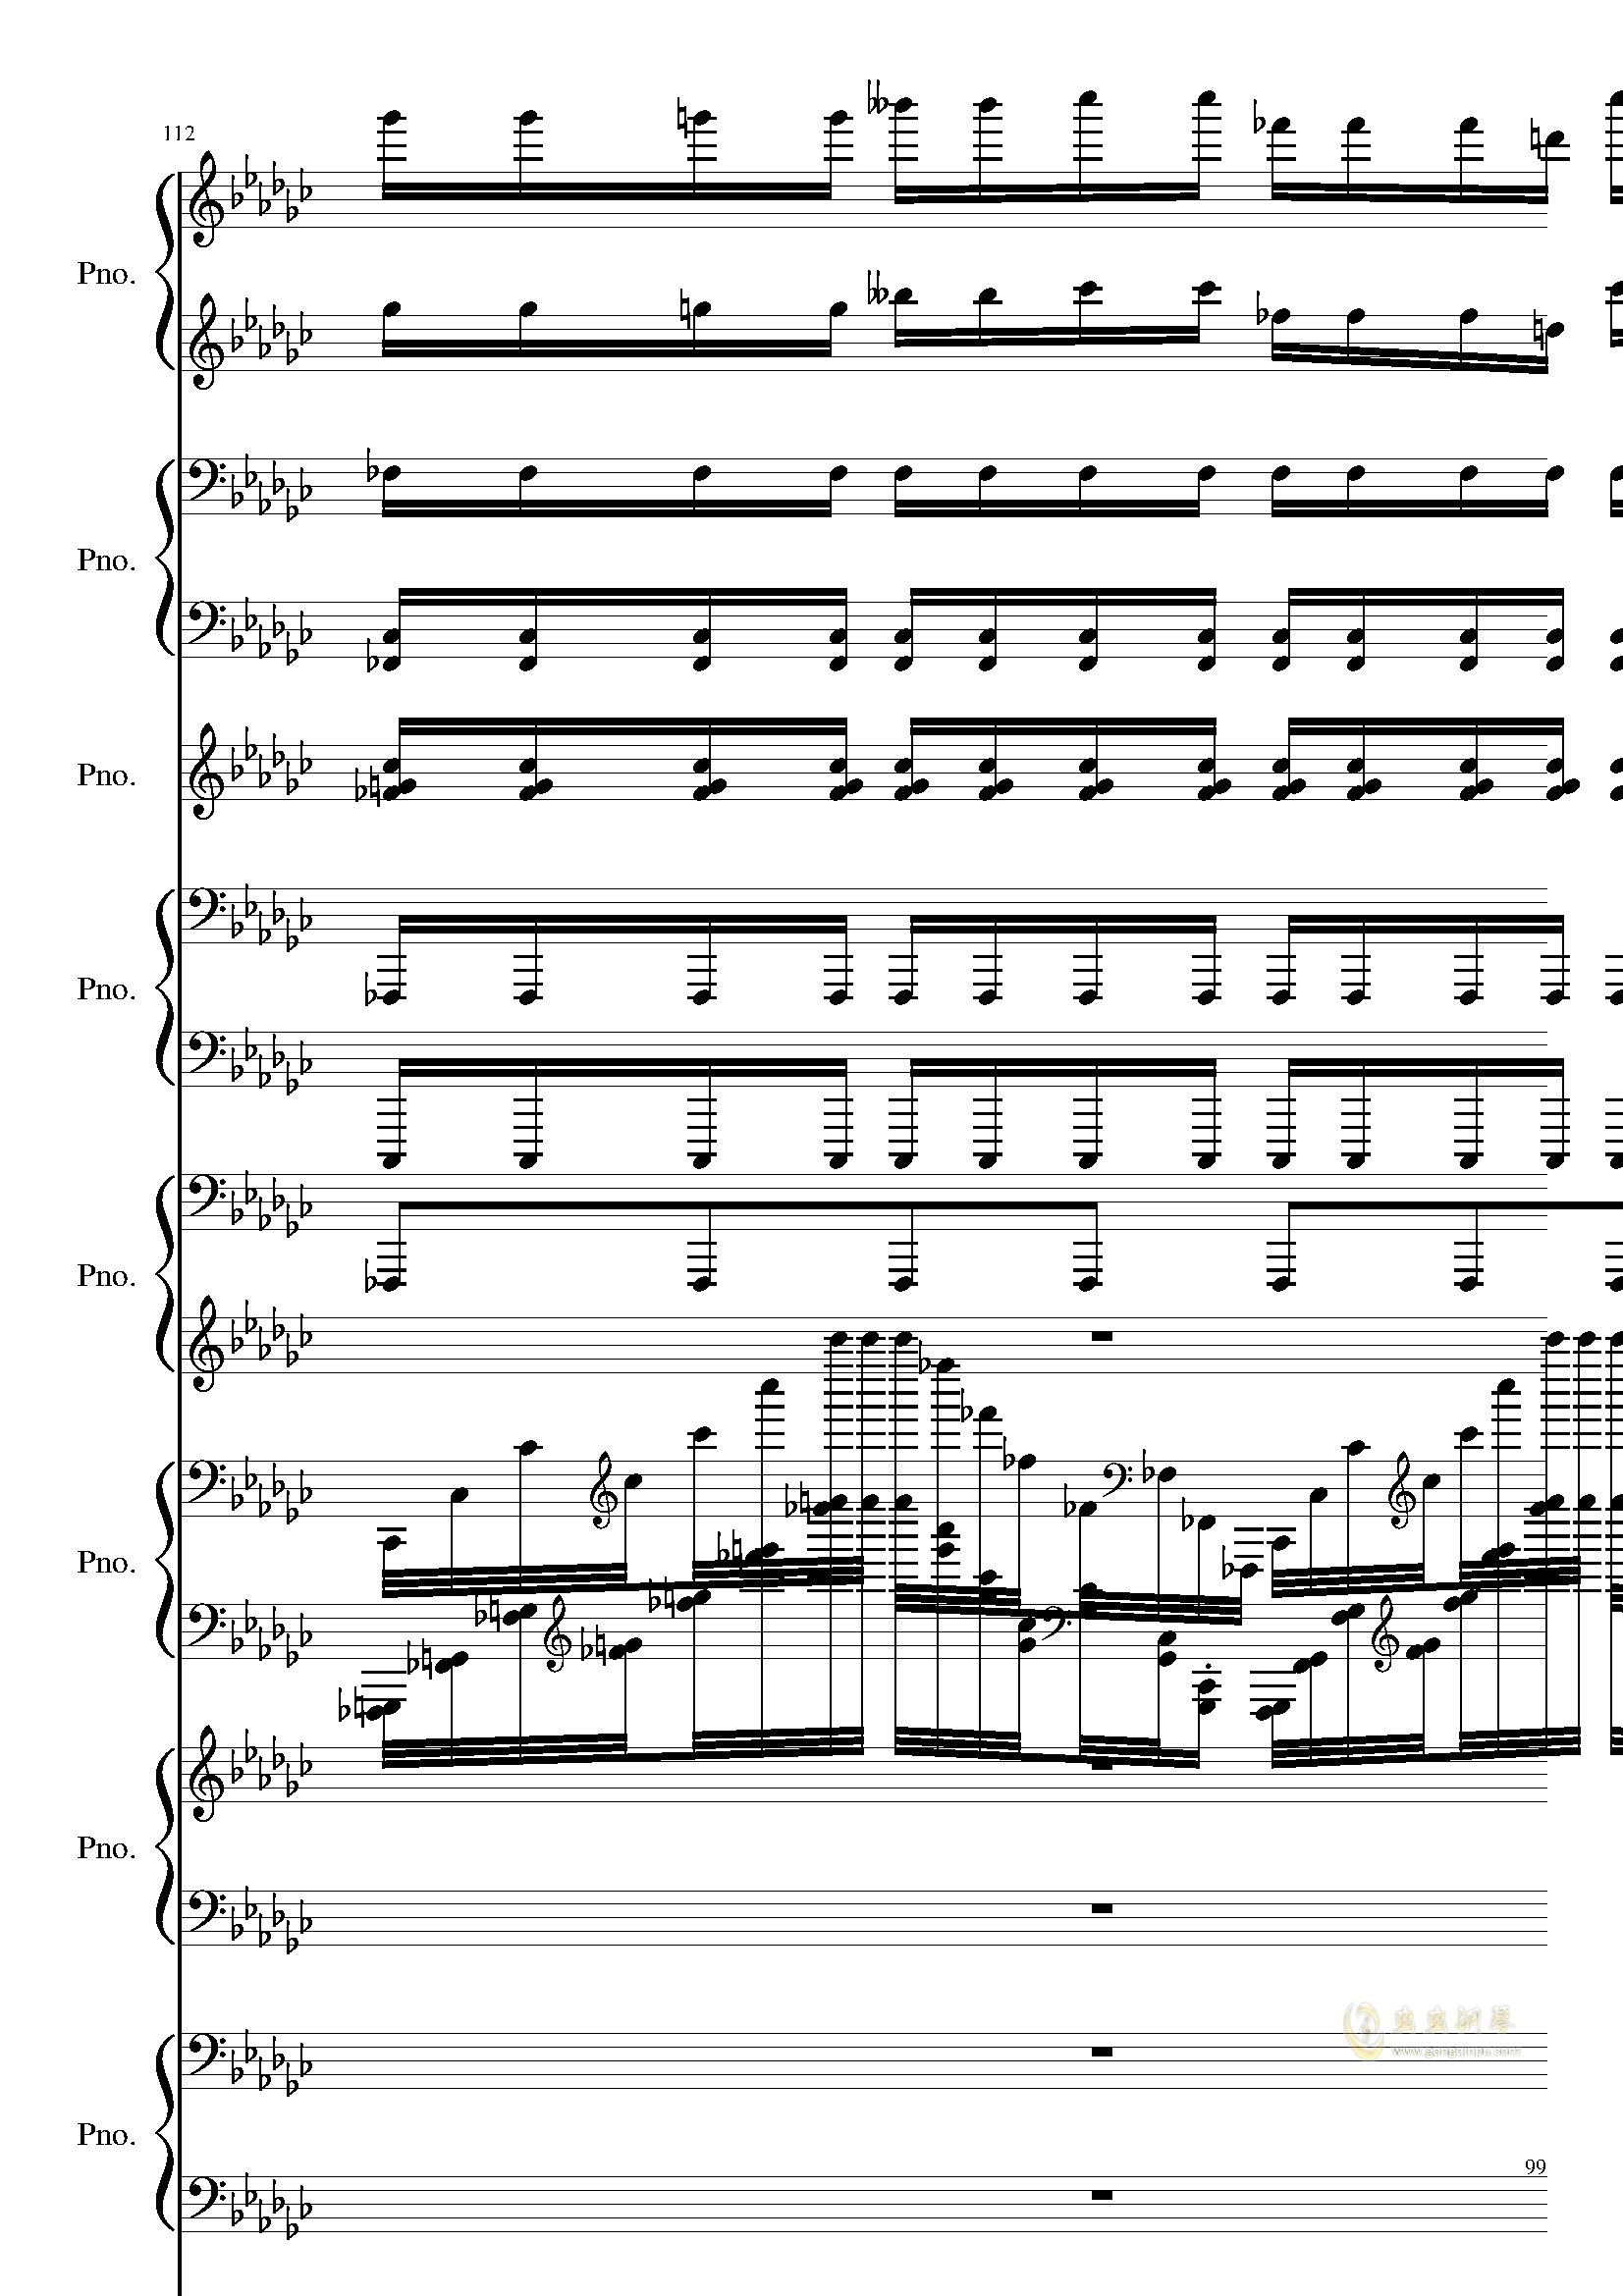 Bad Apple钢琴谱 第99页